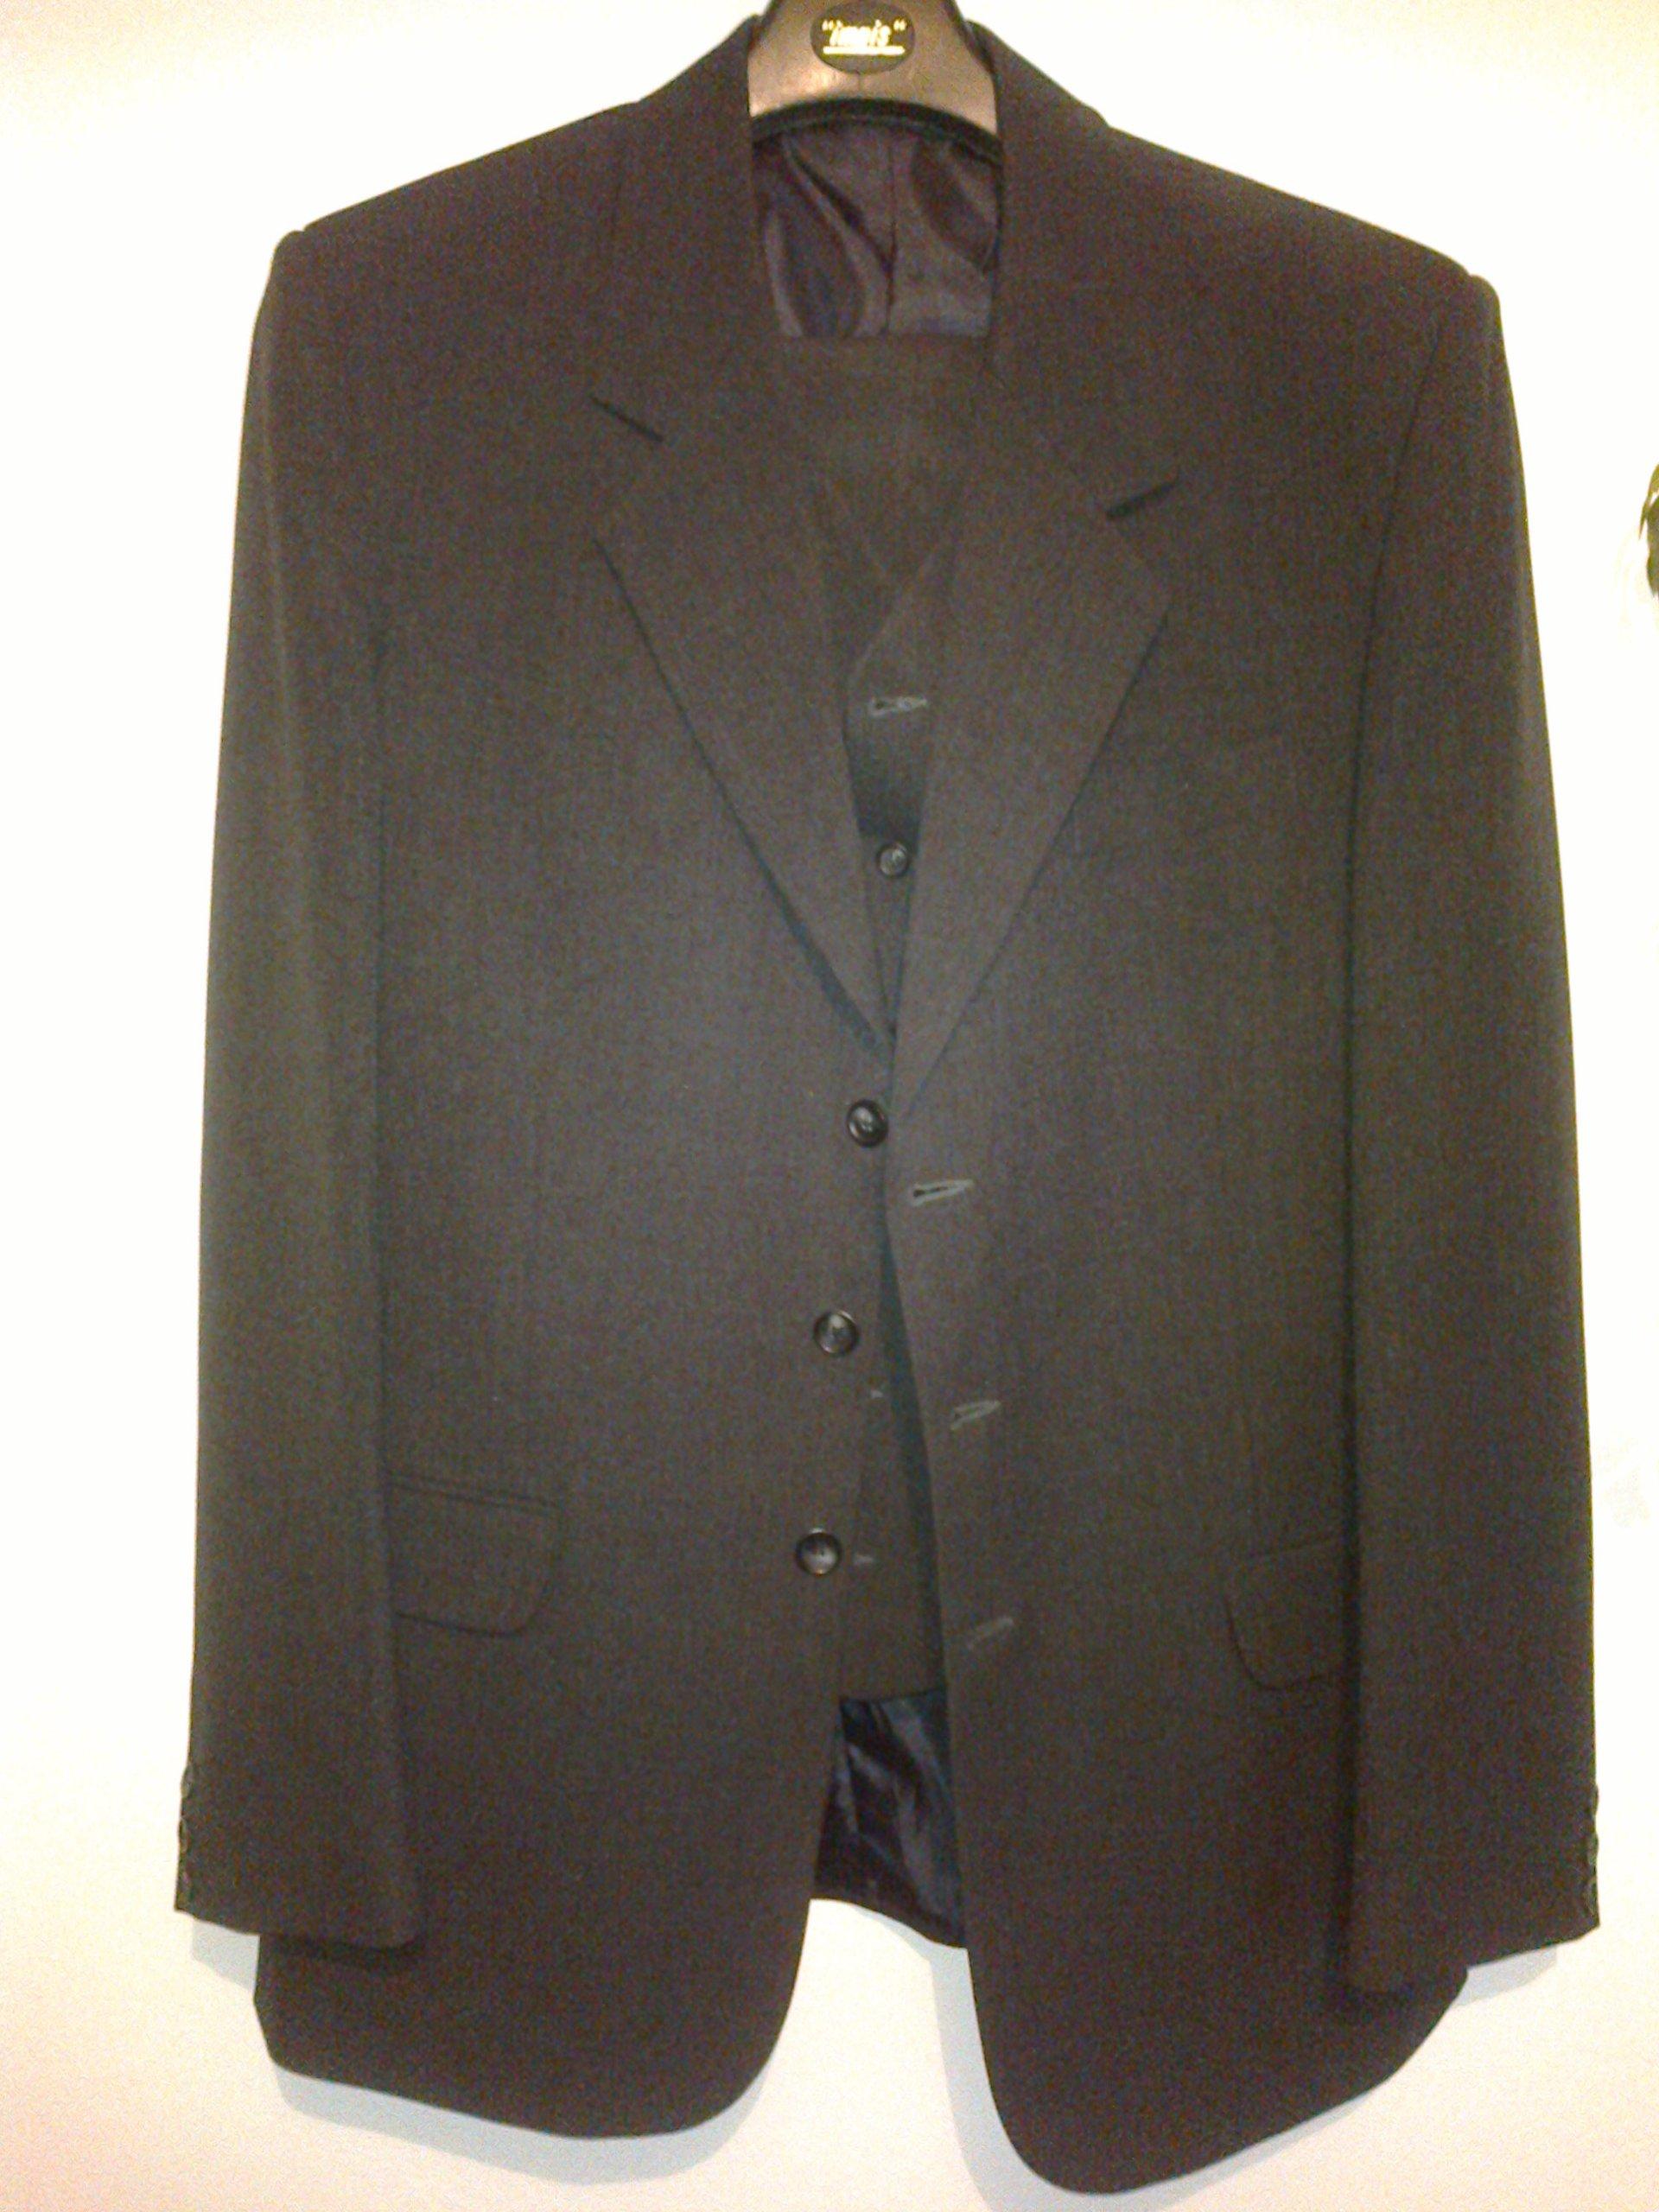 3e17b334647ba garnitur cena w Oficjalnym Archiwum Allegro - archiwum ofert